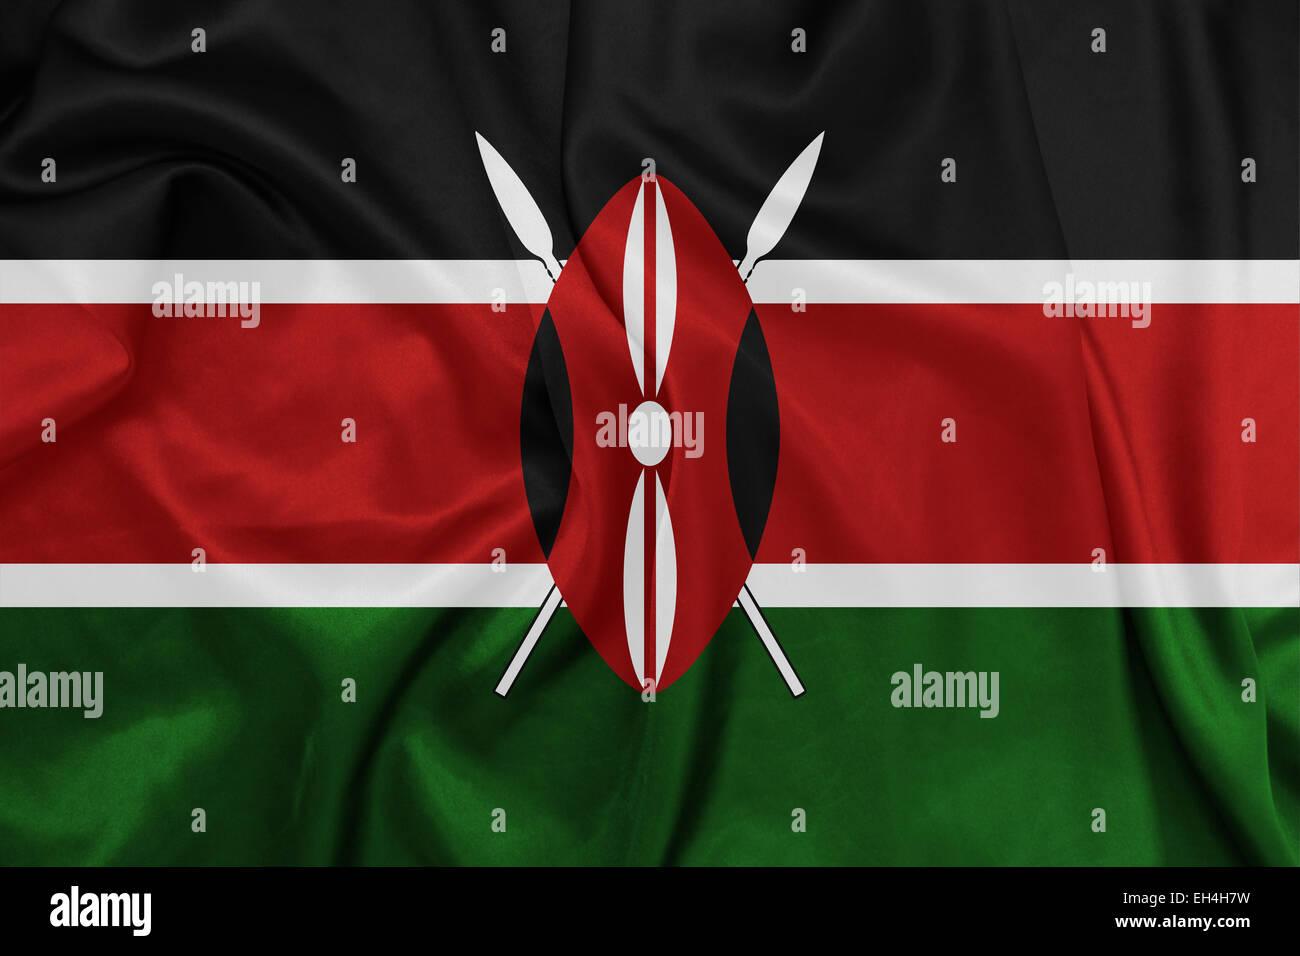 Kenya - Waving national flag on silk texture Stock Photo